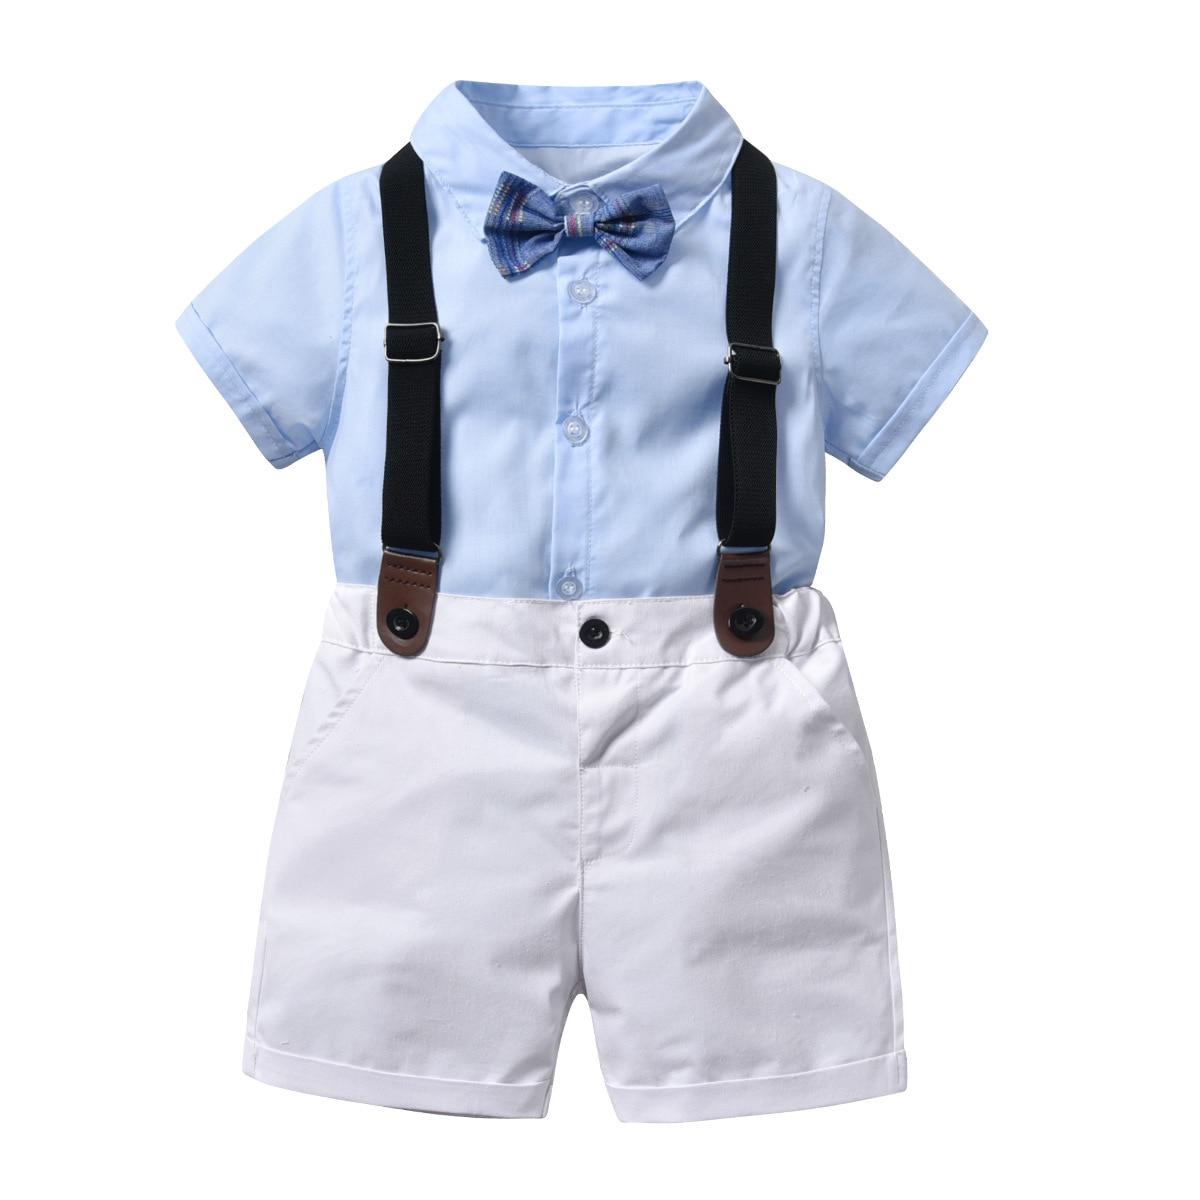 Summer Kids Suits Blazers For Boy Costum 2019 Baby Boys Shirt Overalls Suit Boys Formal Wedding Wear Cotton Children Clothing